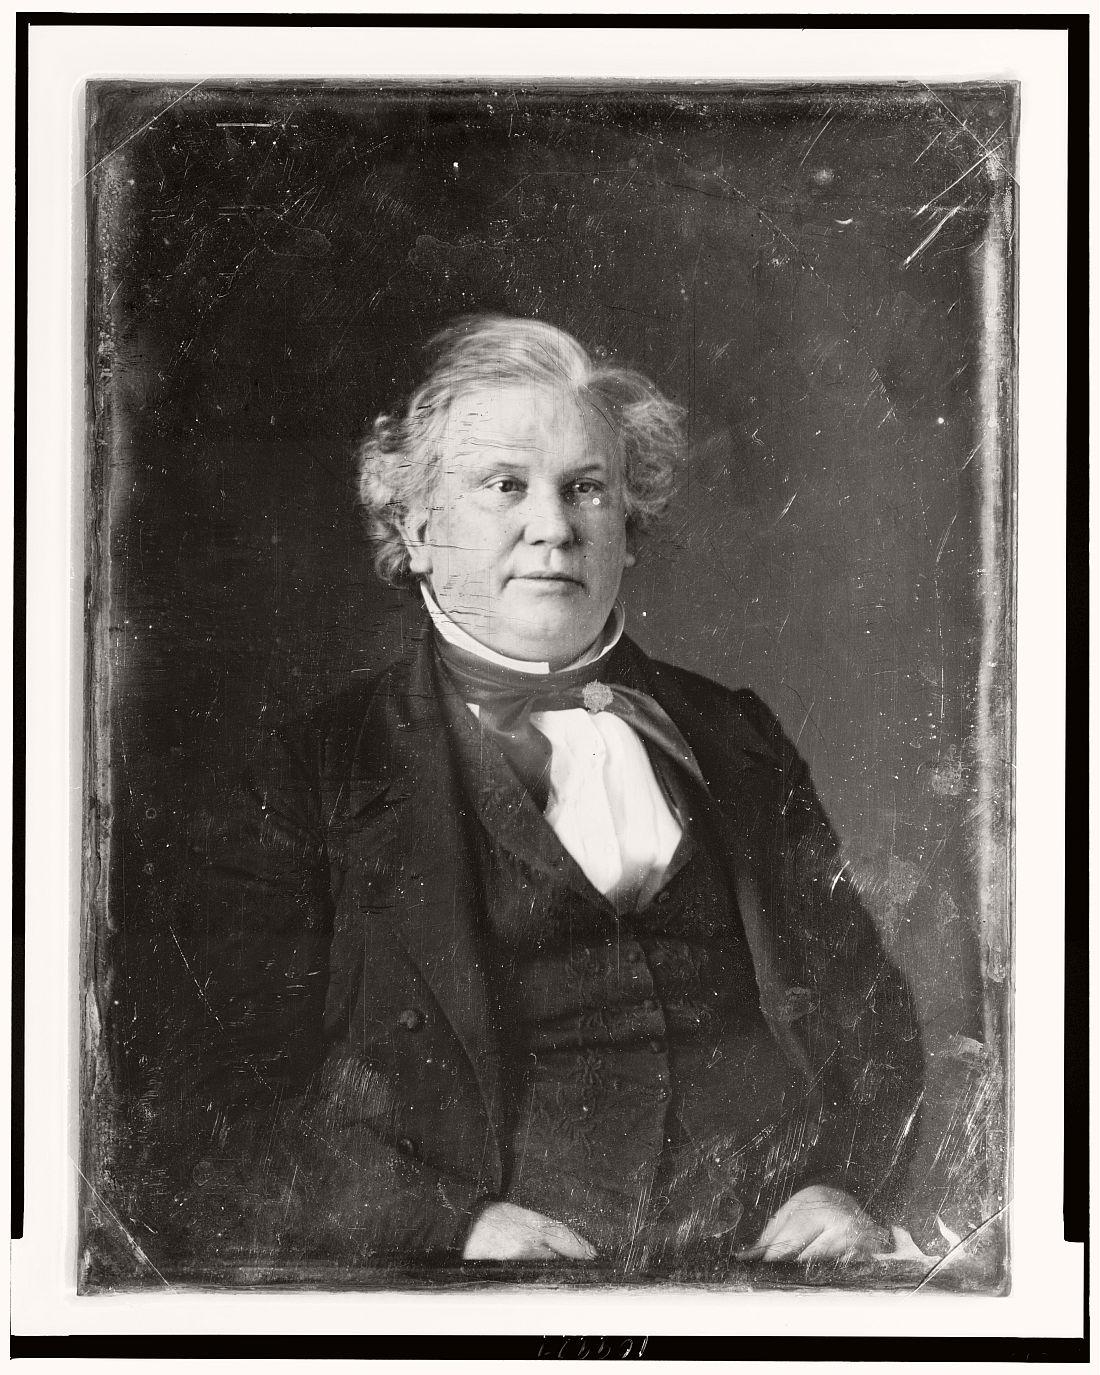 vintage-daguerreotype-portraits-from-xix-century-1844-1860-25